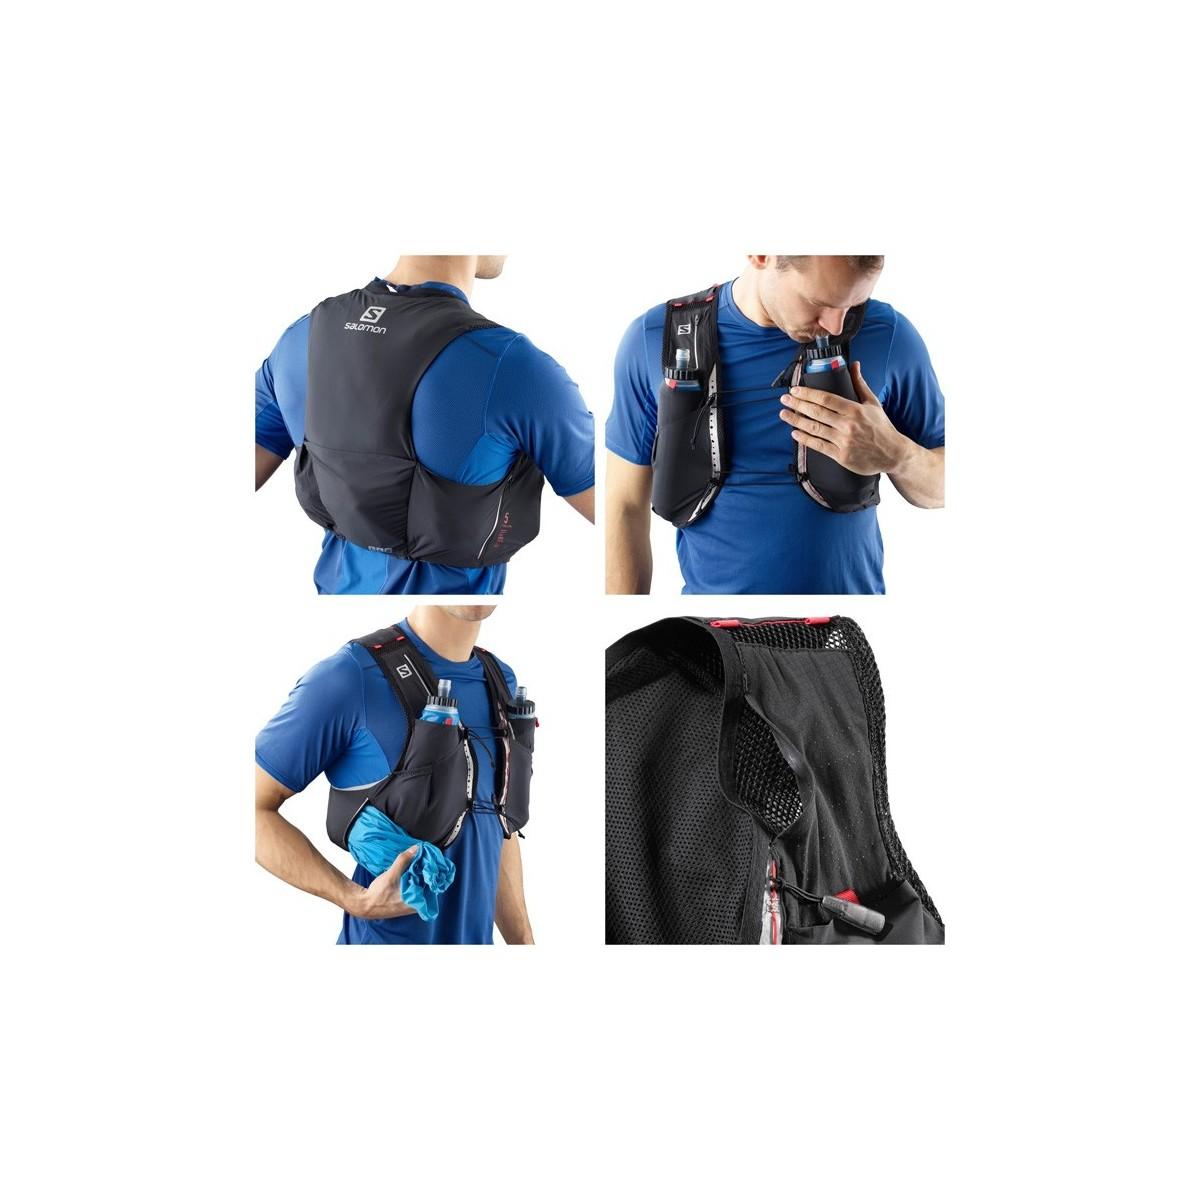 SALOMON vest S-Lab Sense Ultra 5 Set